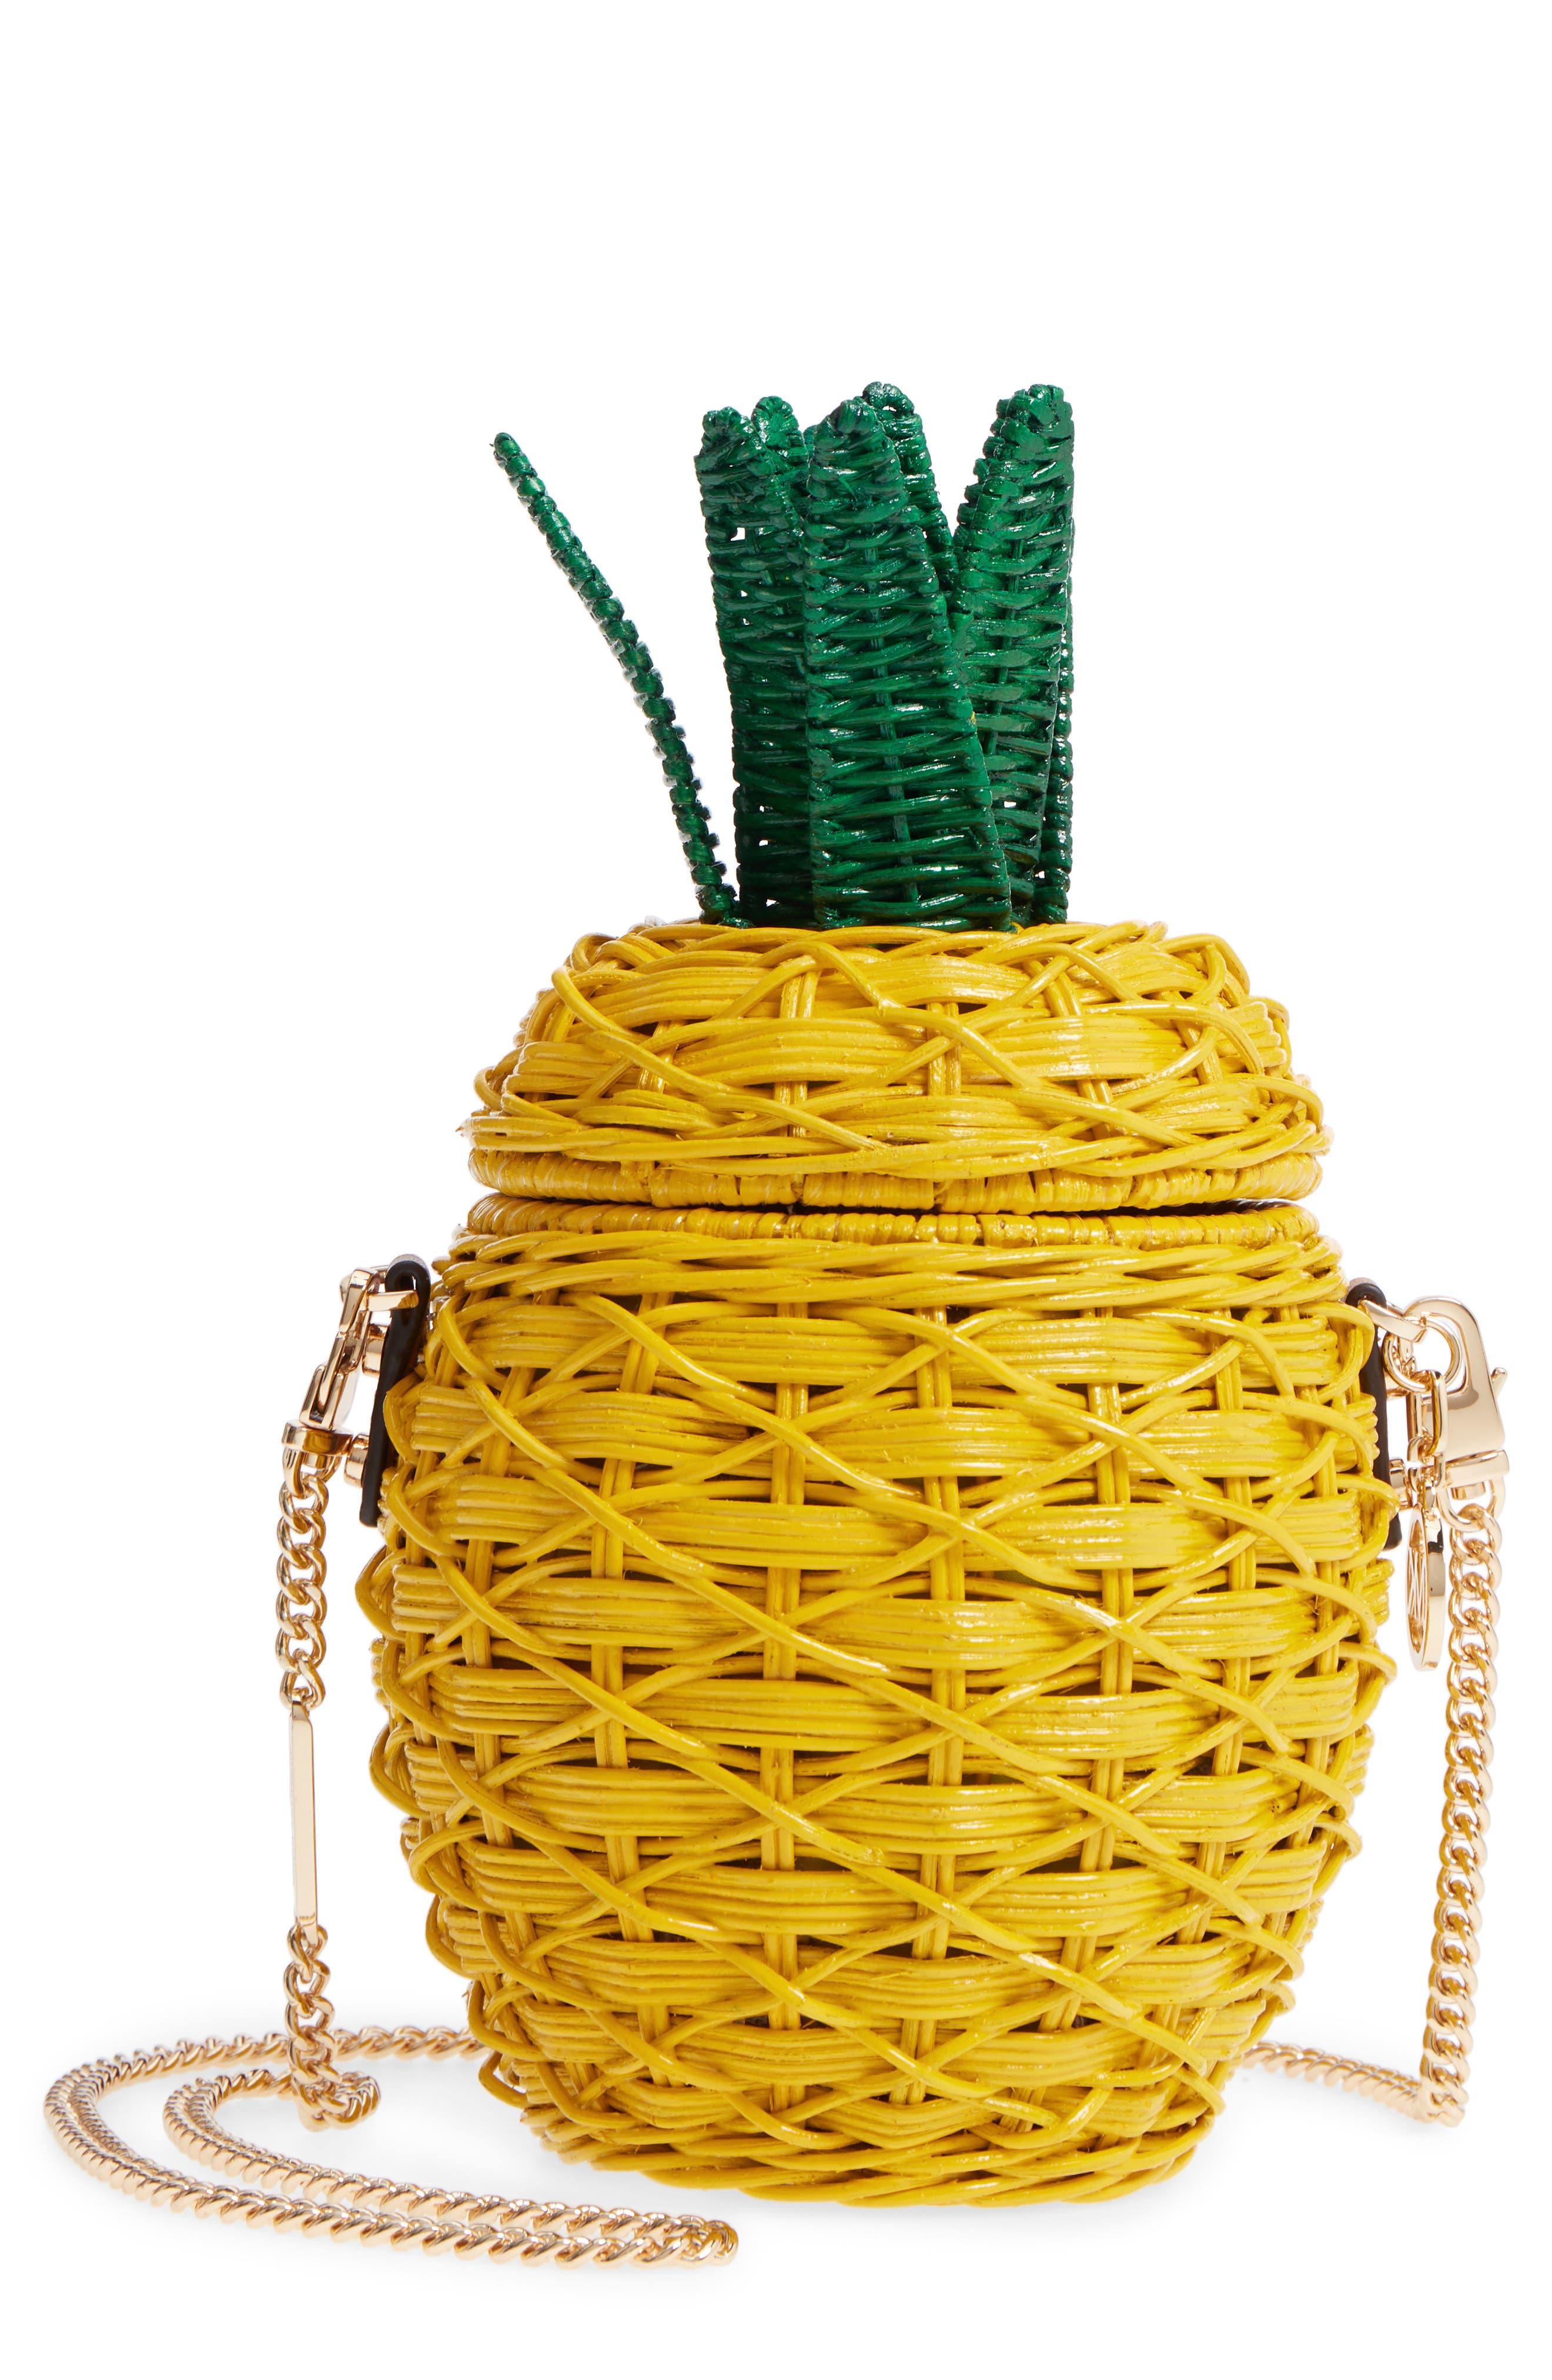 MICHAEL Michael Kors Wicker Pineapple Shoulder Bag,                             Main thumbnail 1, color,                             Sunflower